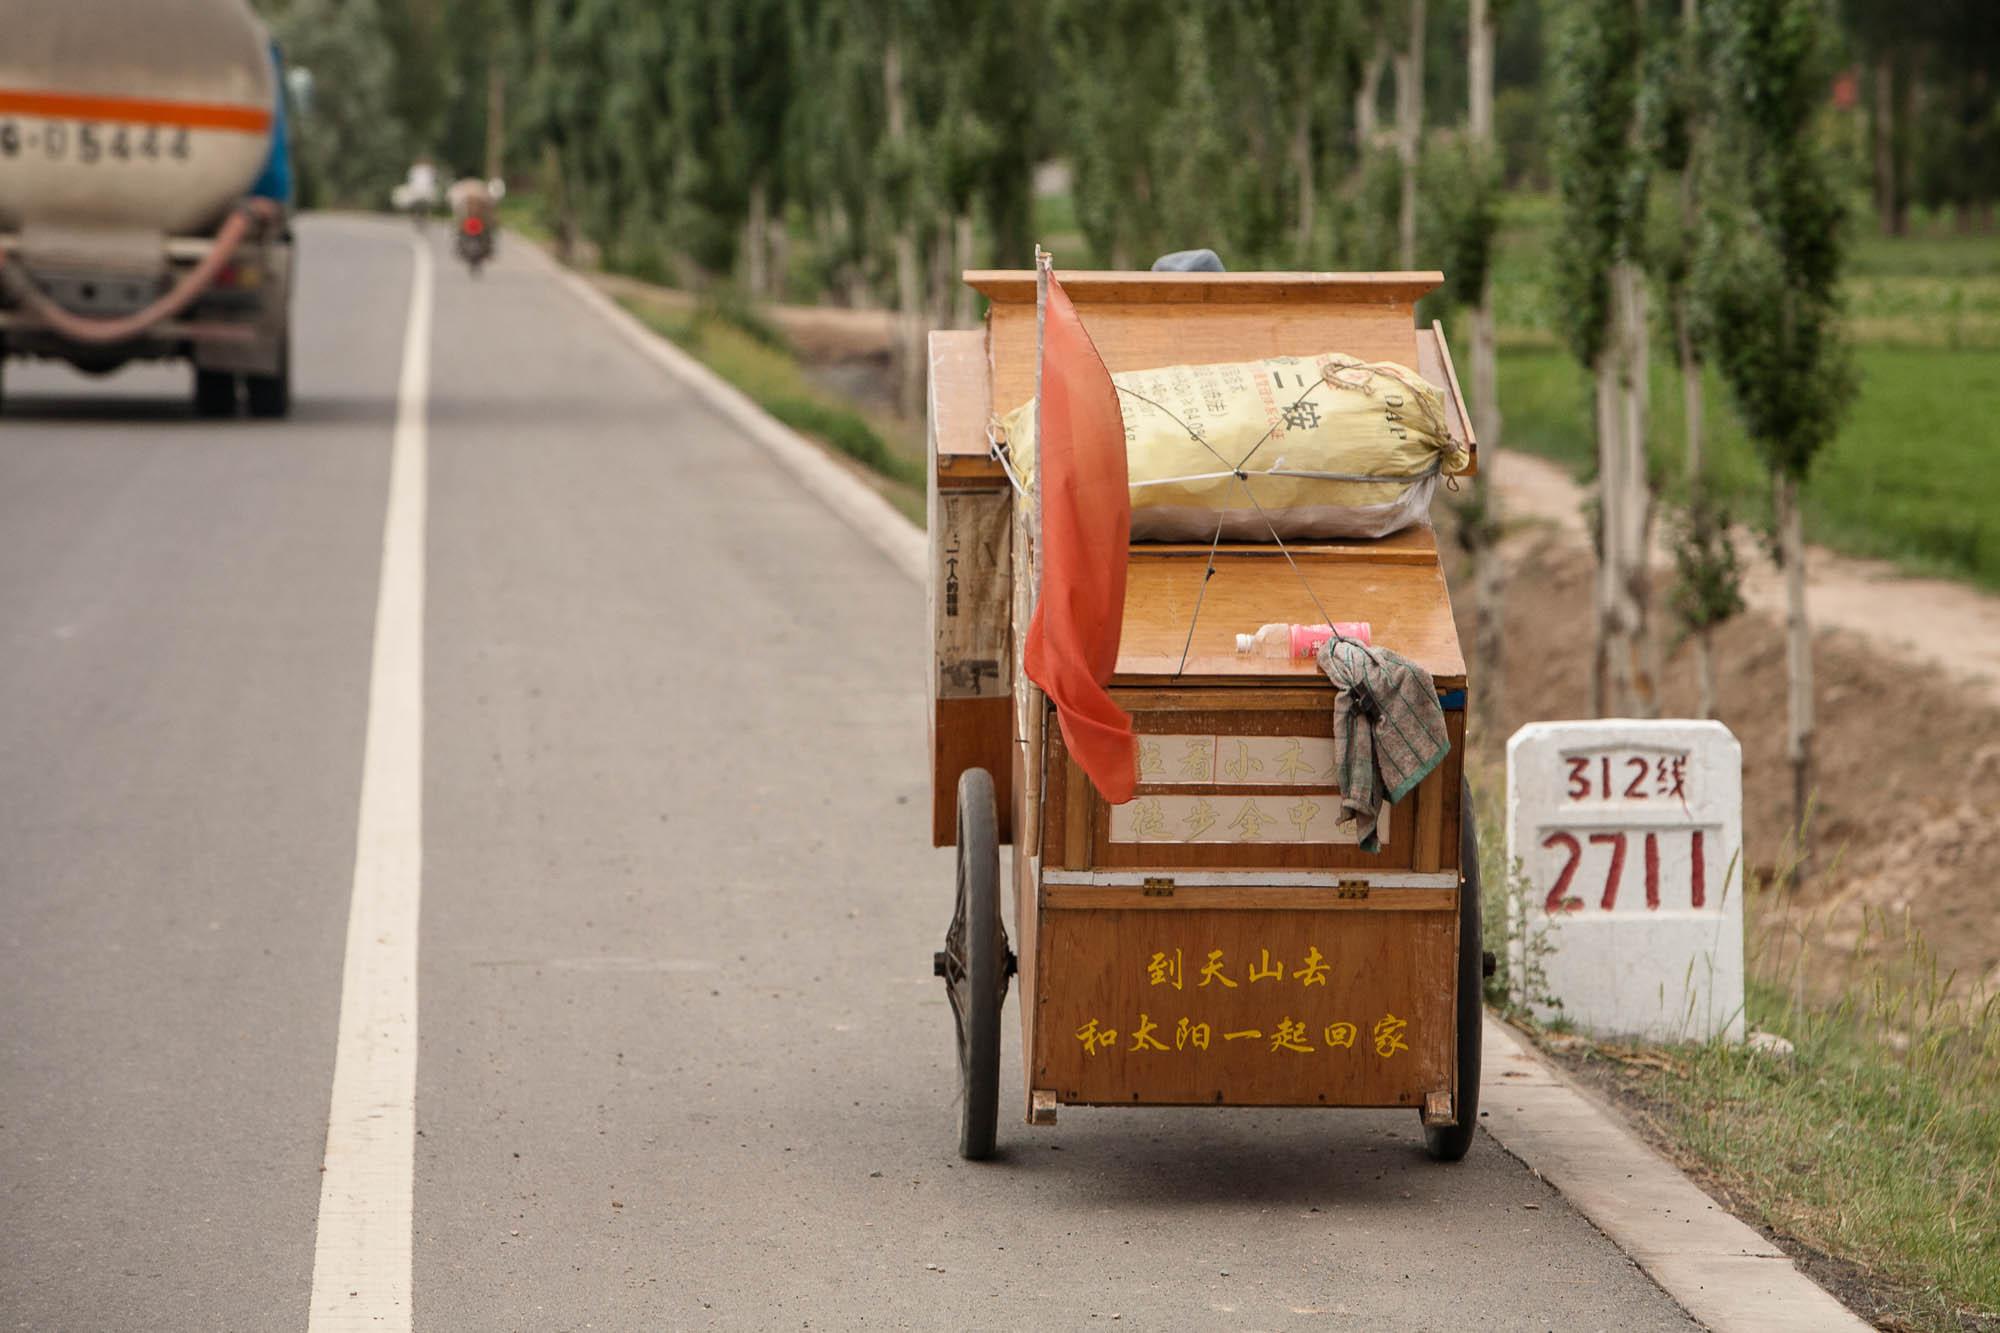 Teacher Xie's cart